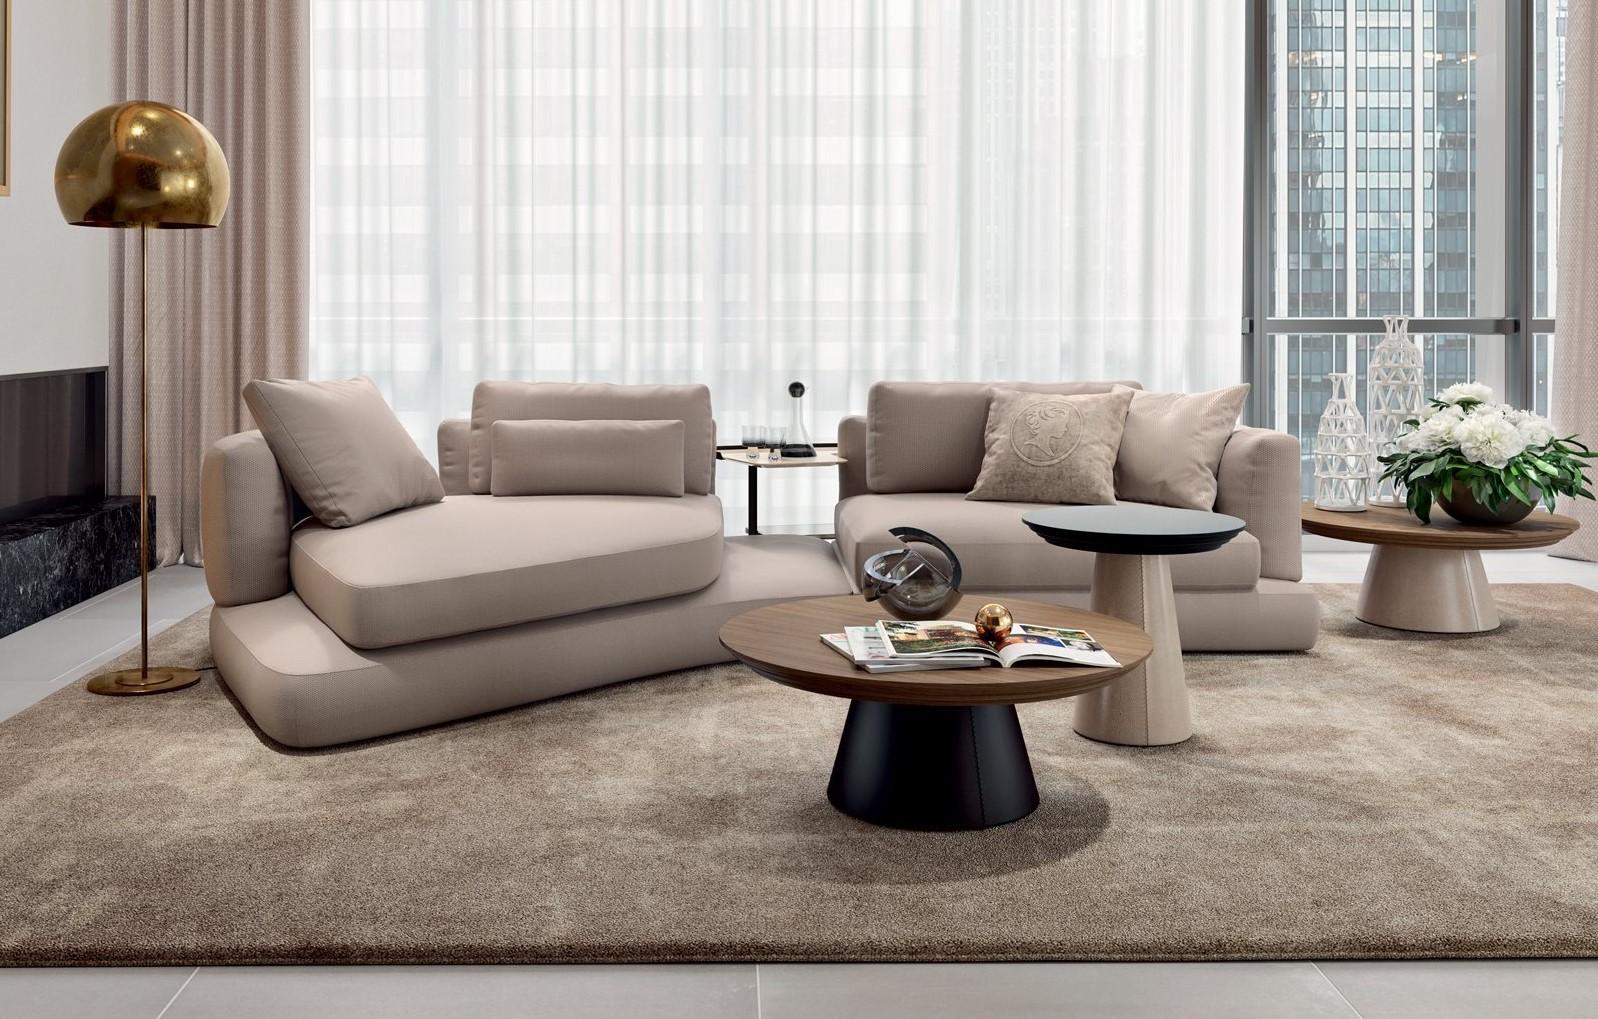 living room 6_arabesque_234640379 (2)